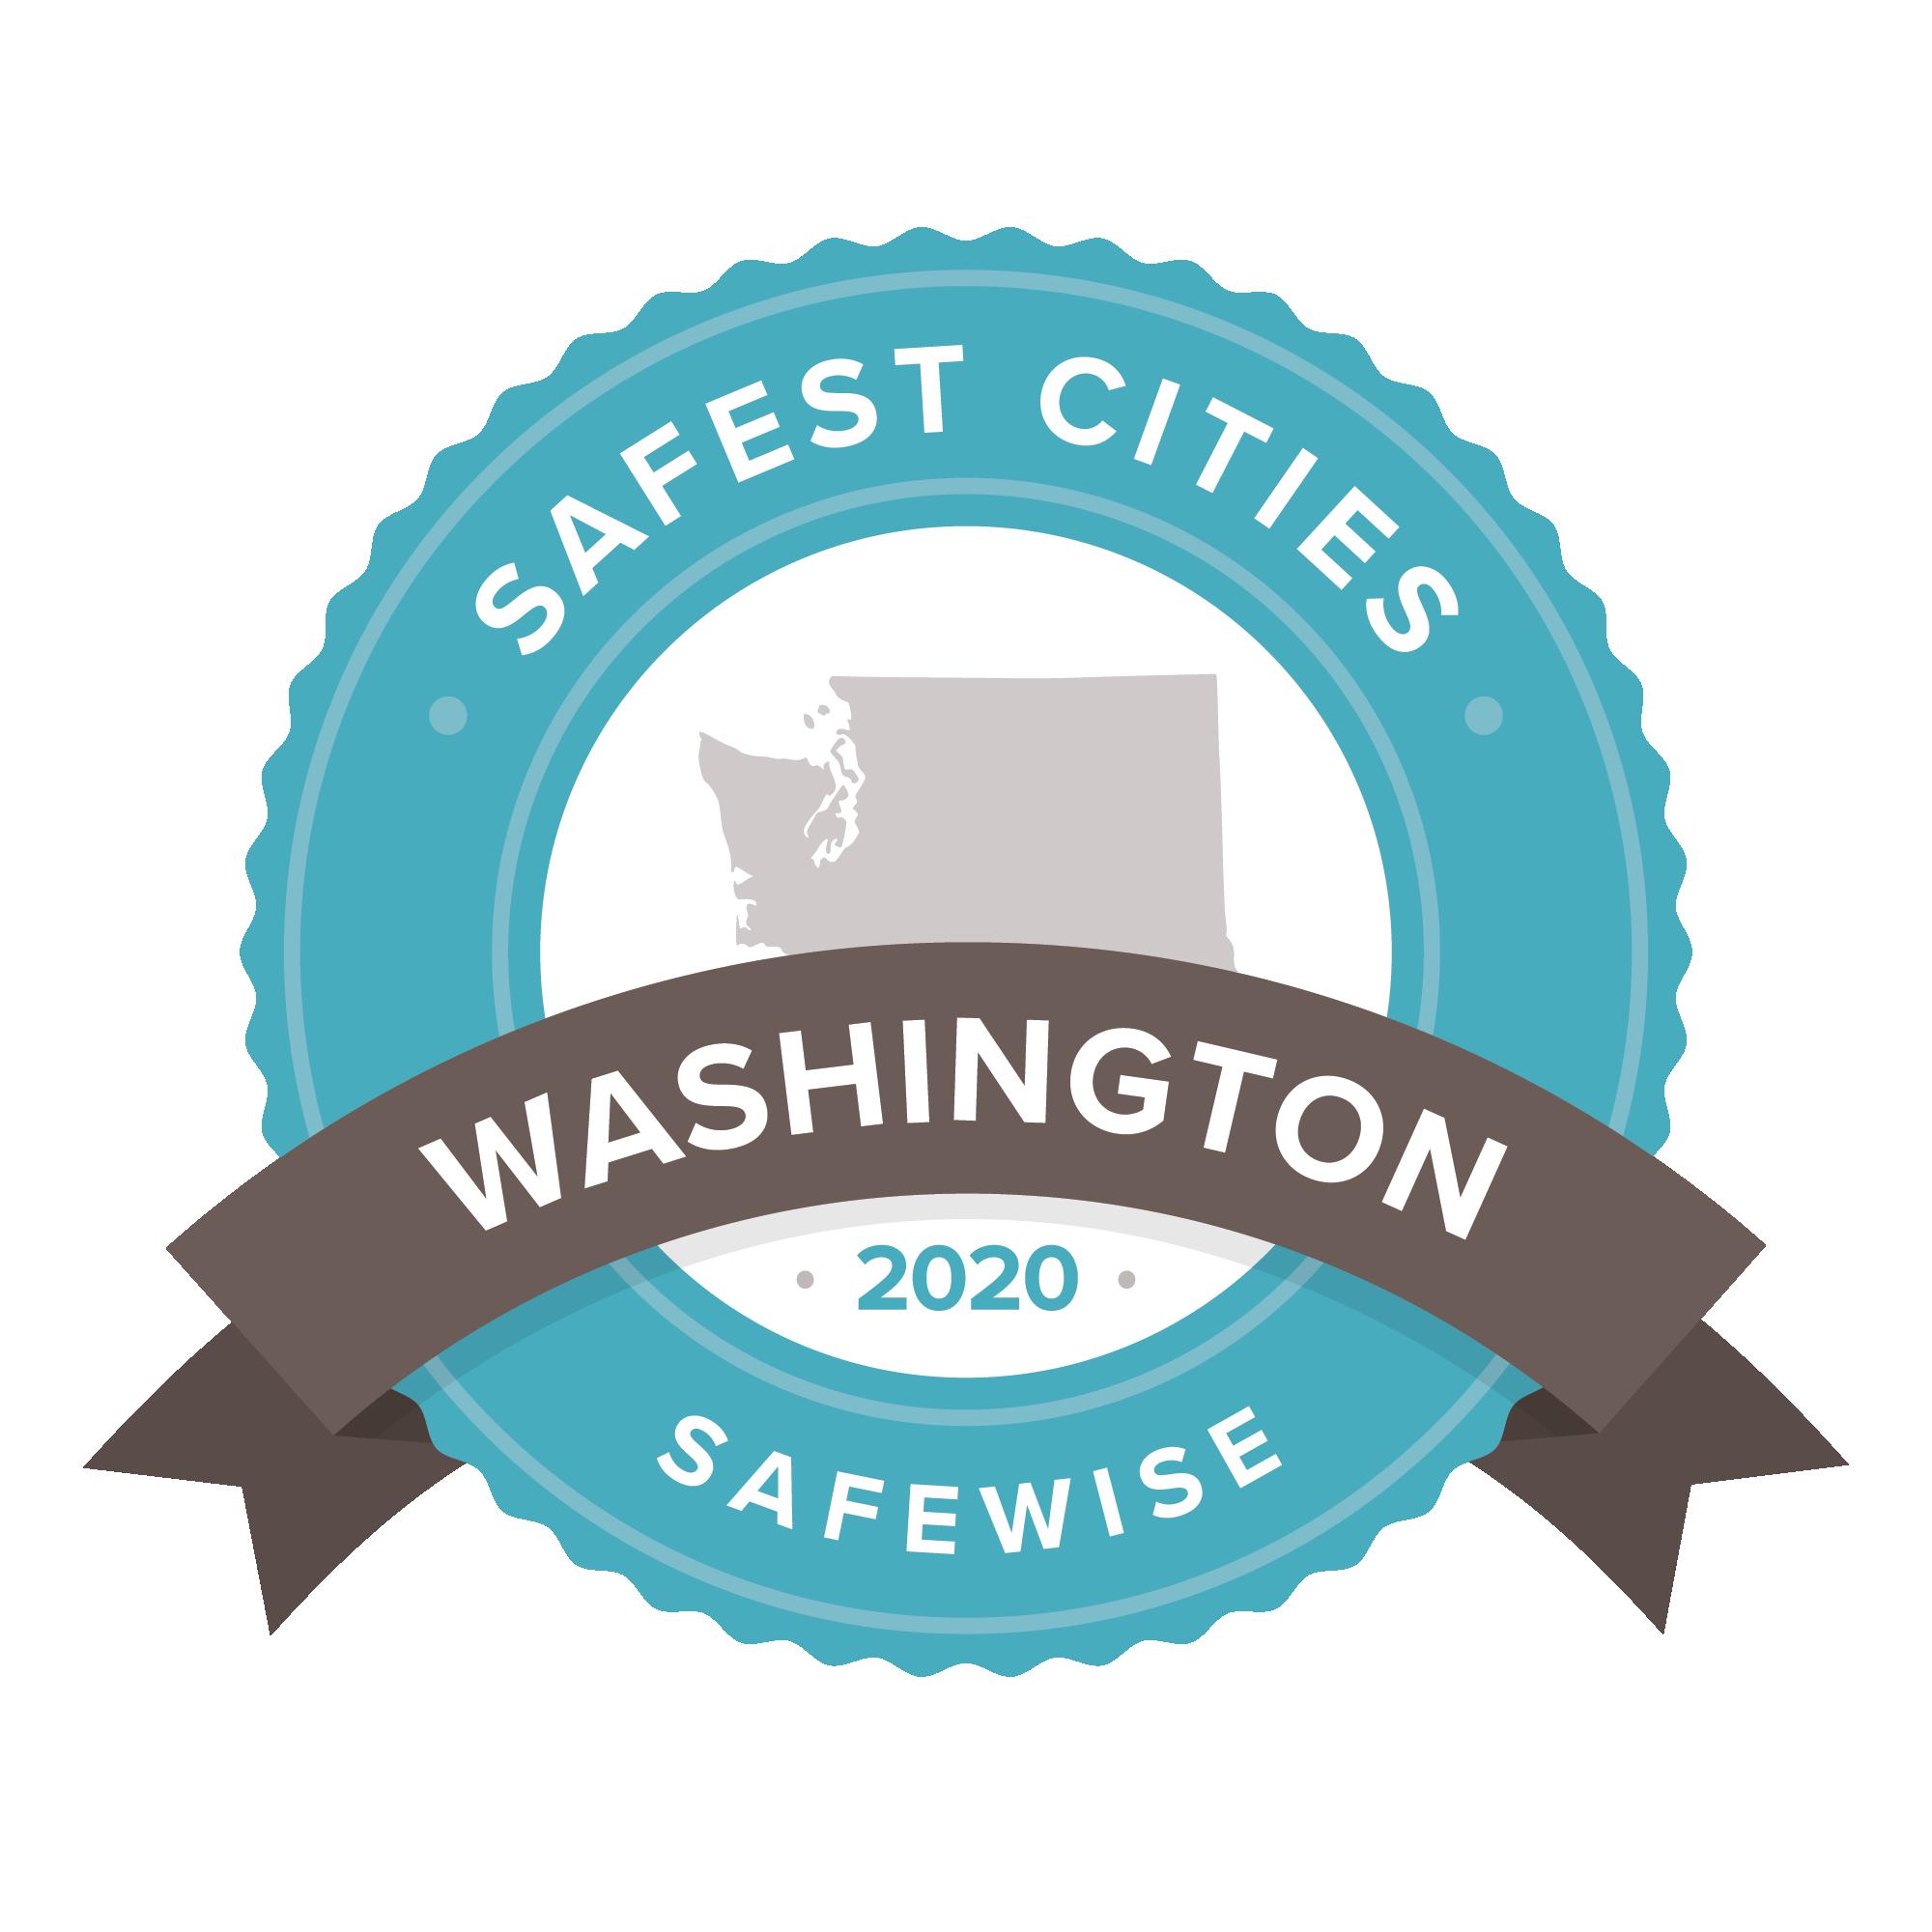 Safest Cities in Washington 2020 badge